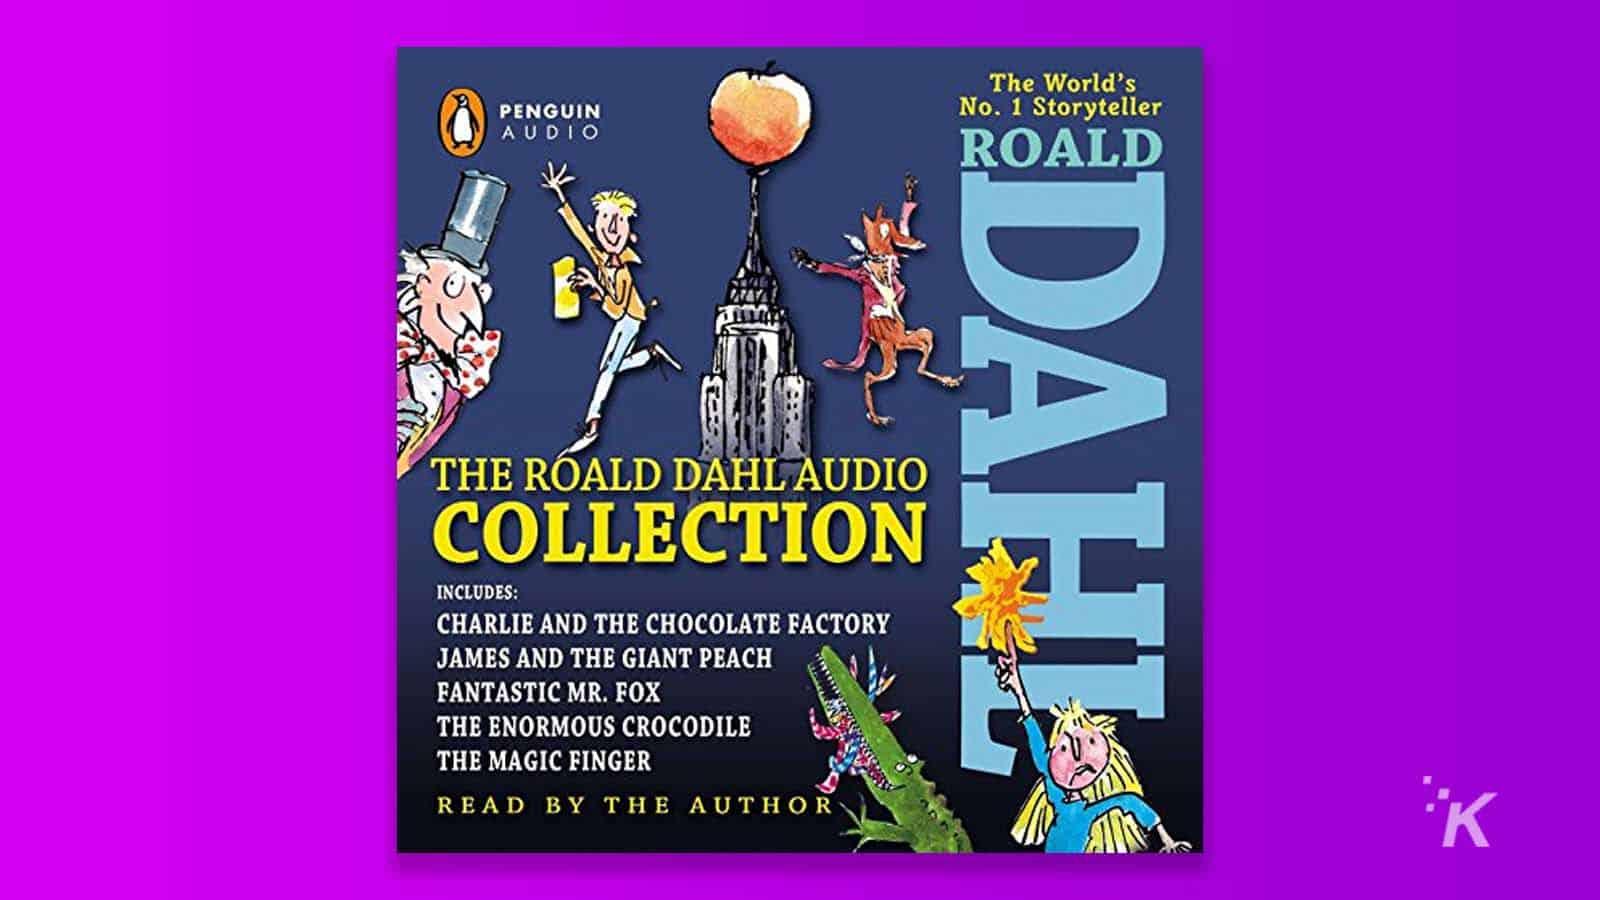 the roald dahl audio collection